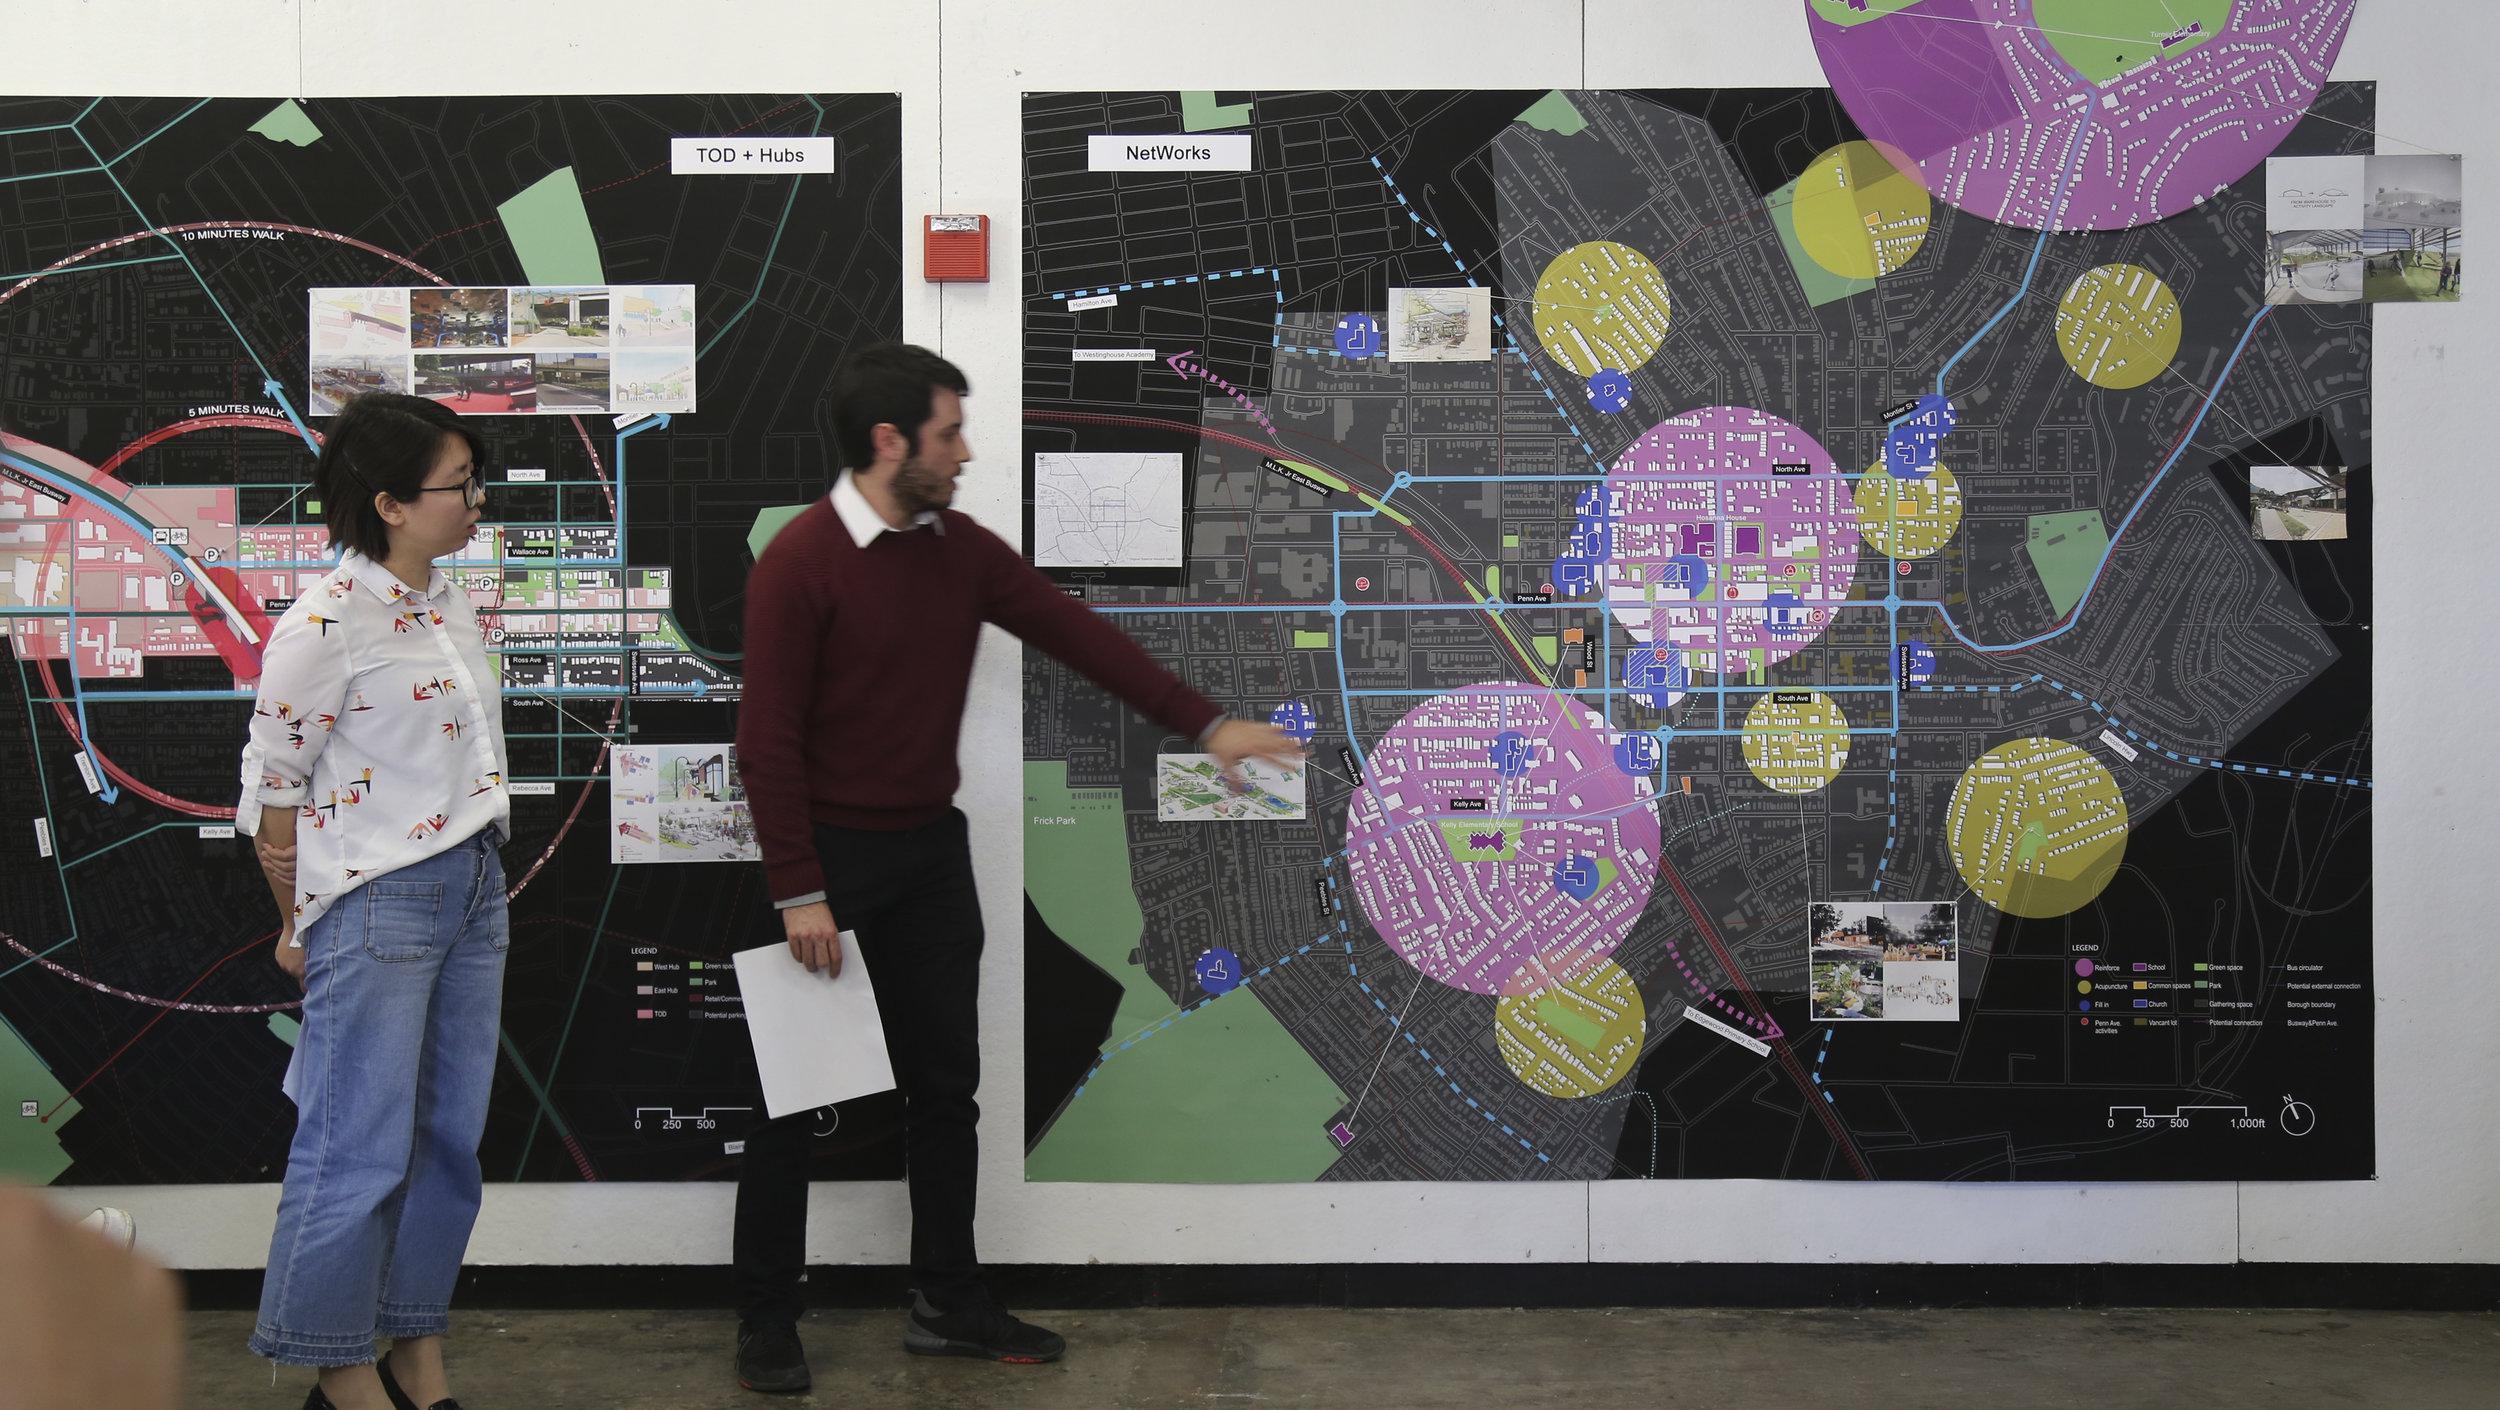 1_MUD_WORK_Urban-Magnetic-Field-masterplan-by-Professor-Stefan-Gruber.jpg